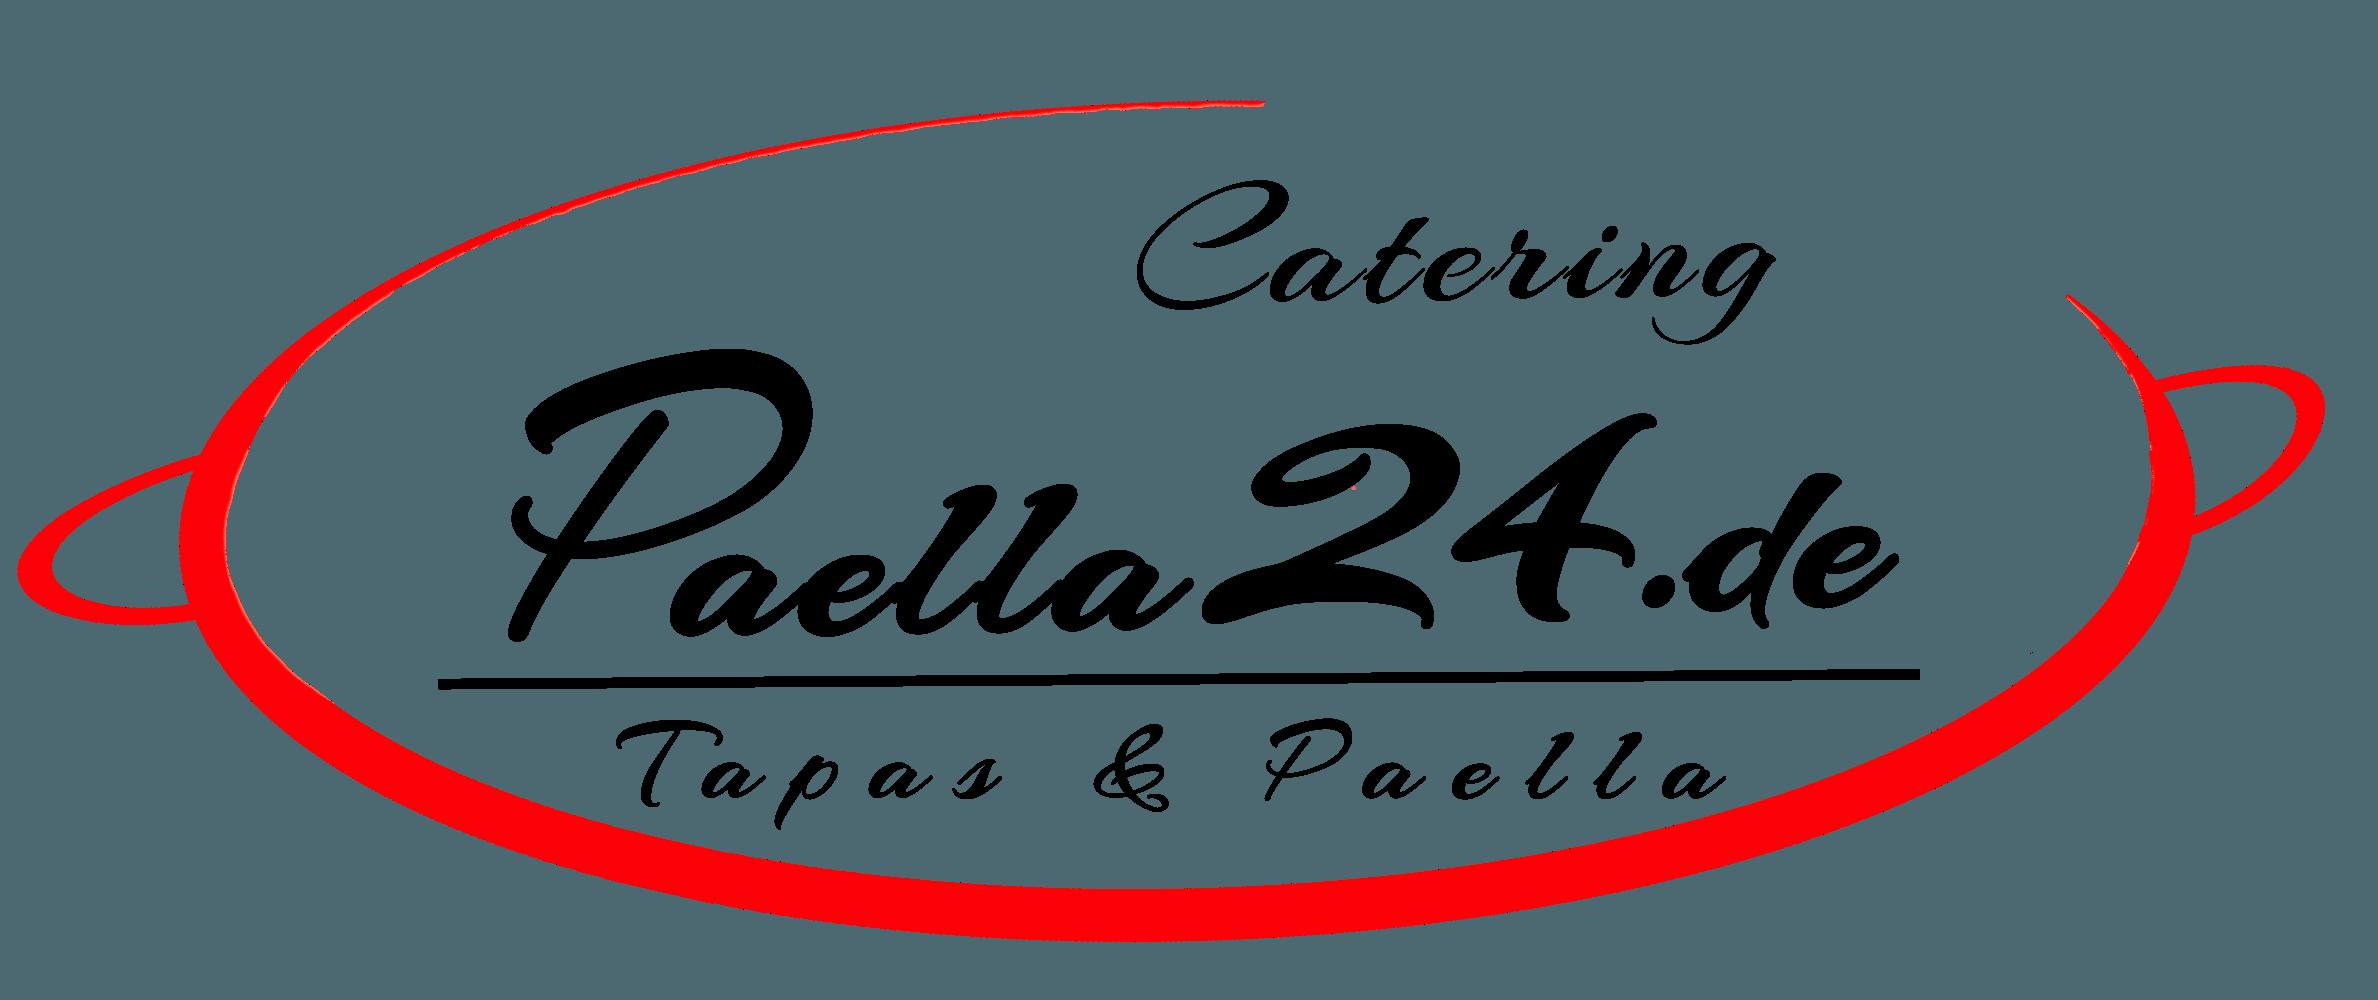 Spanisches Paella Catering